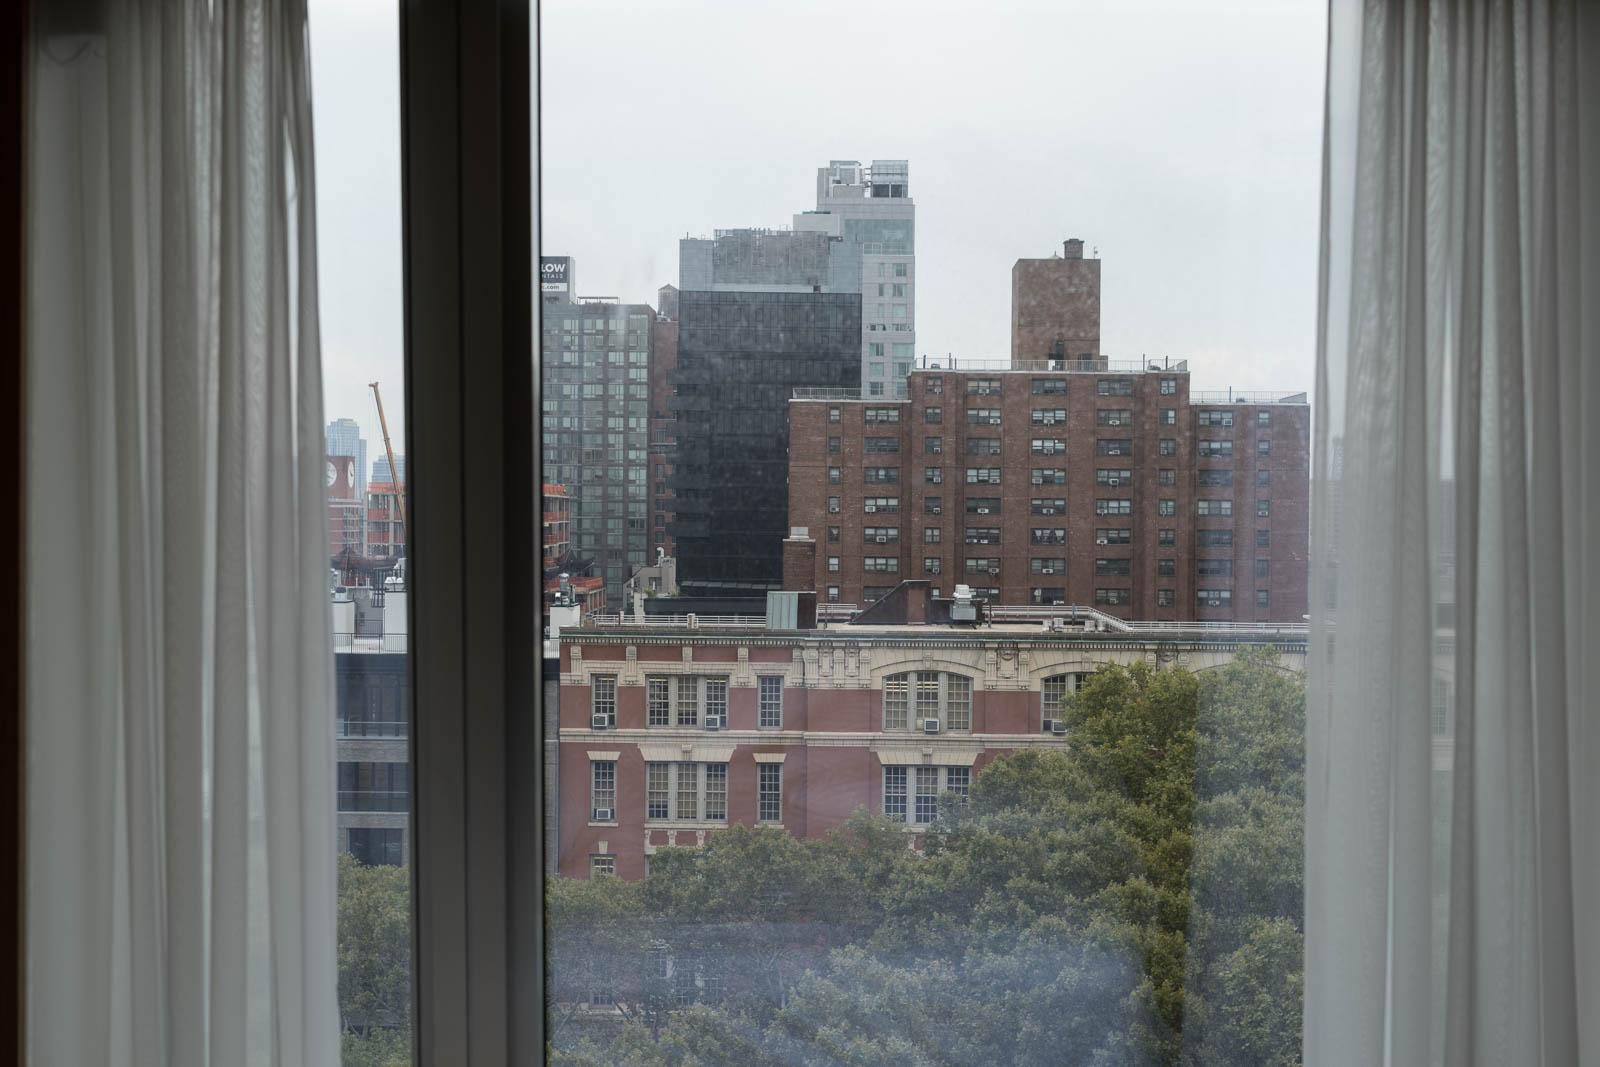 Room 1009, Hotel Public NYC